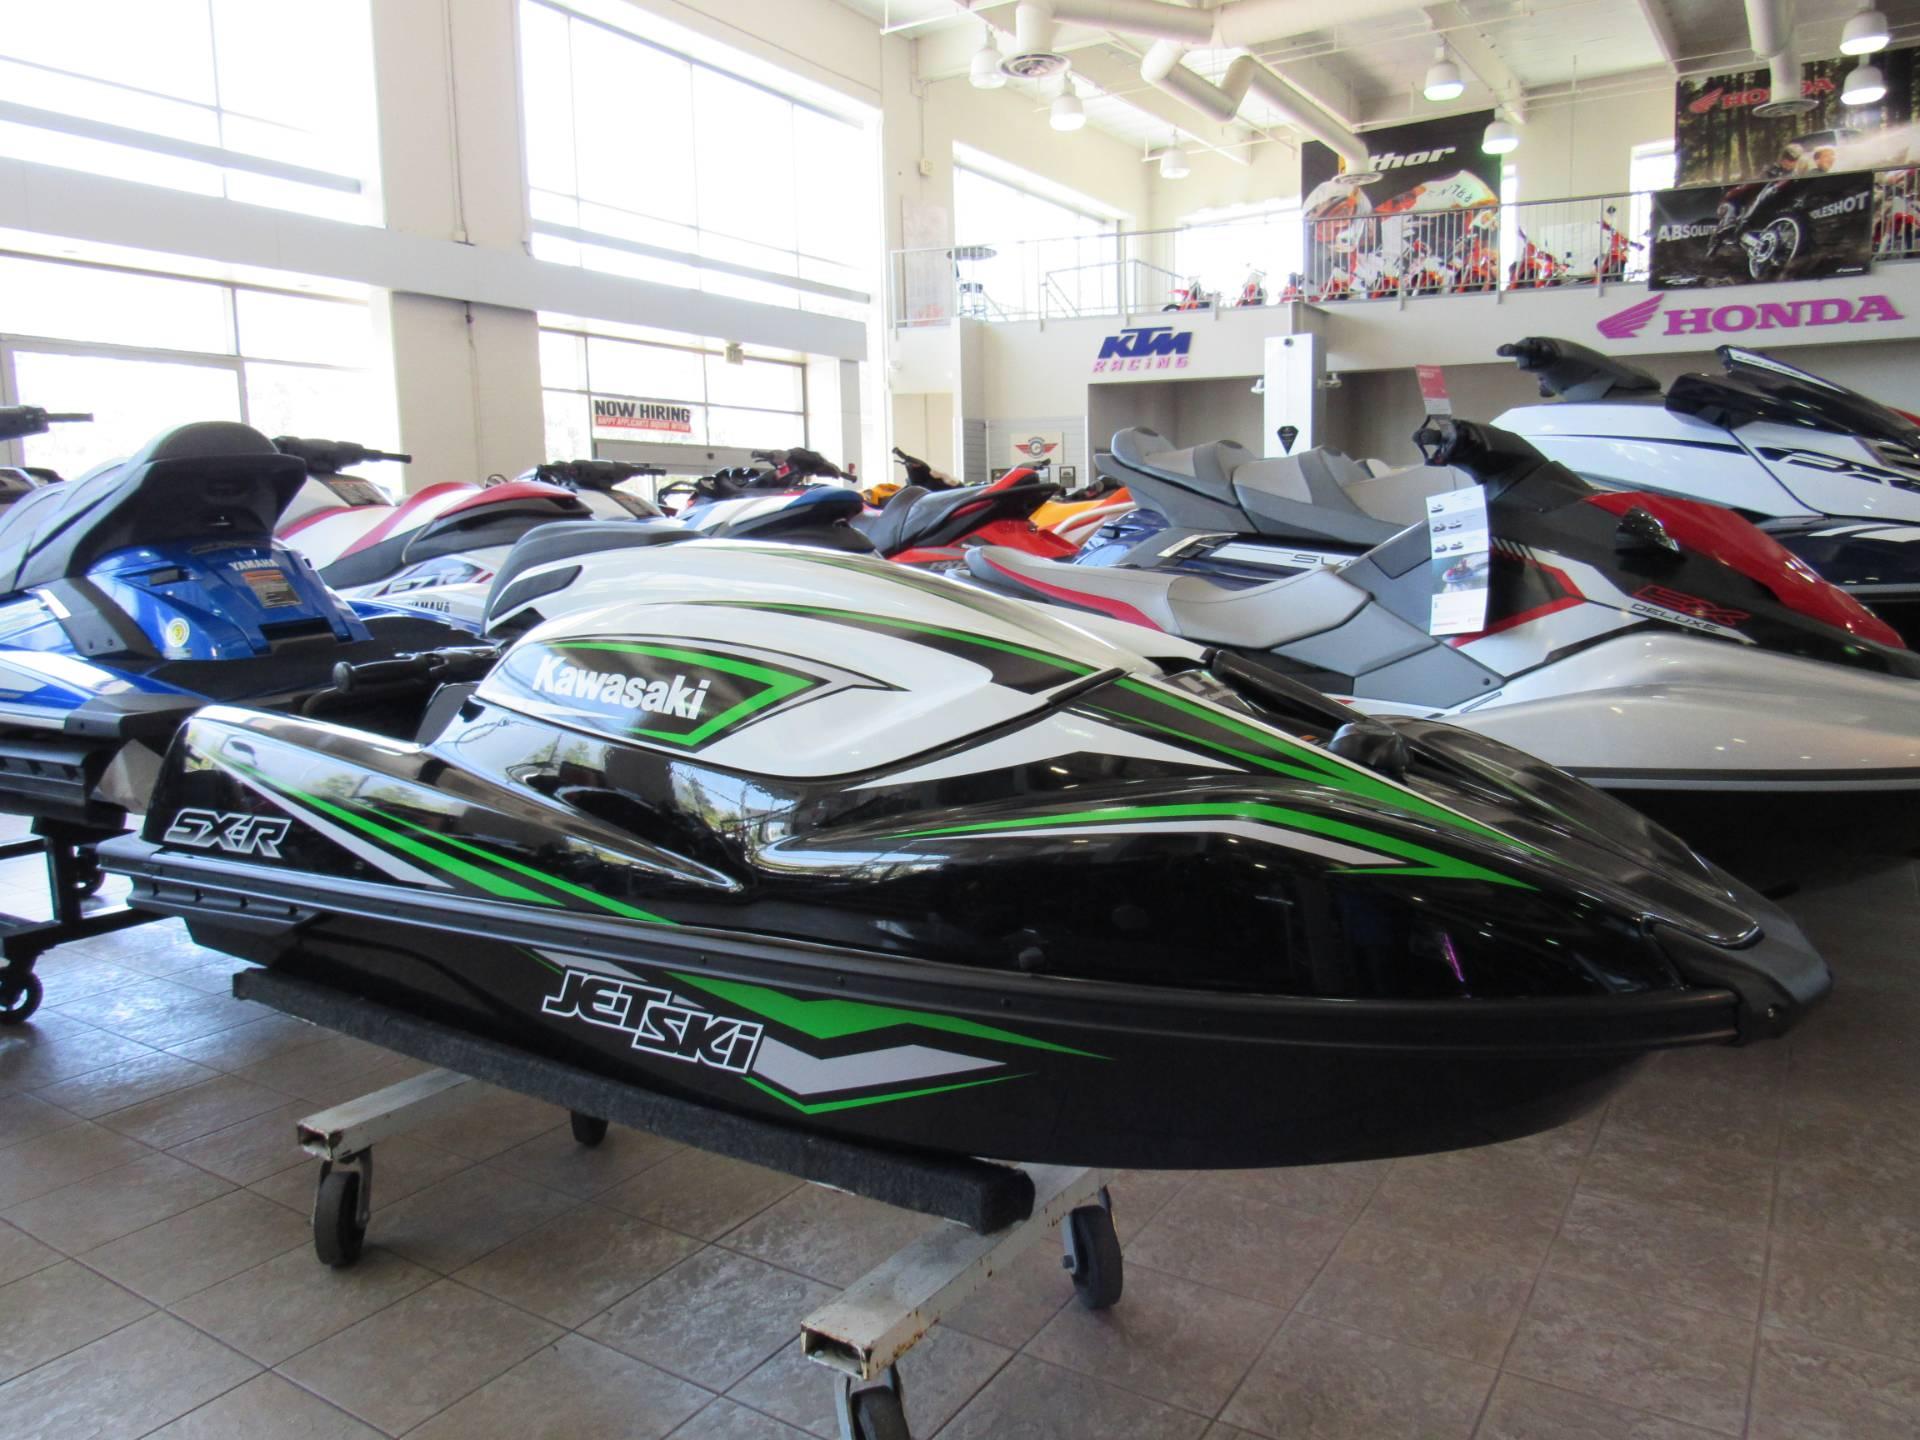 new 2017 kawasaki jet ski sx-r watercraft in irvine, ca   stock